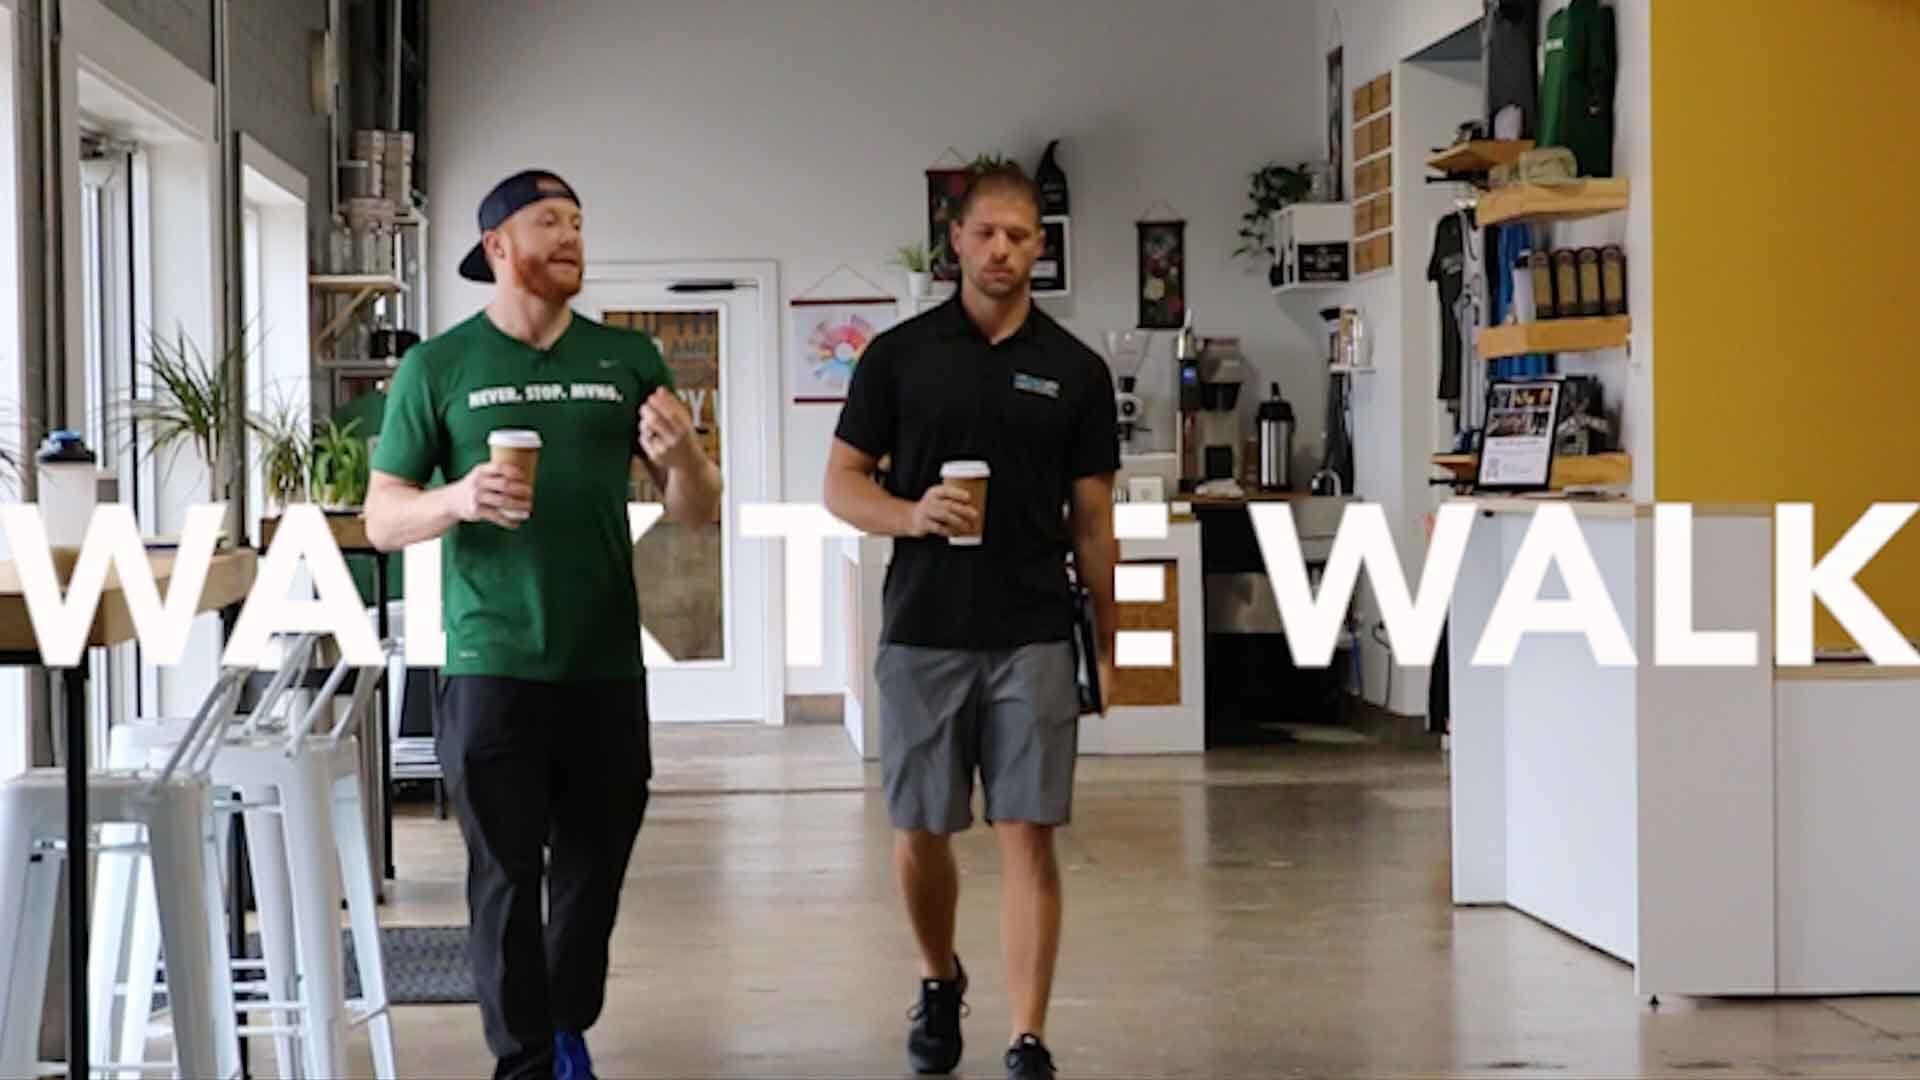 WTF Gym Talk | Walk the Walk w/ CrossFit Northport - Day 2